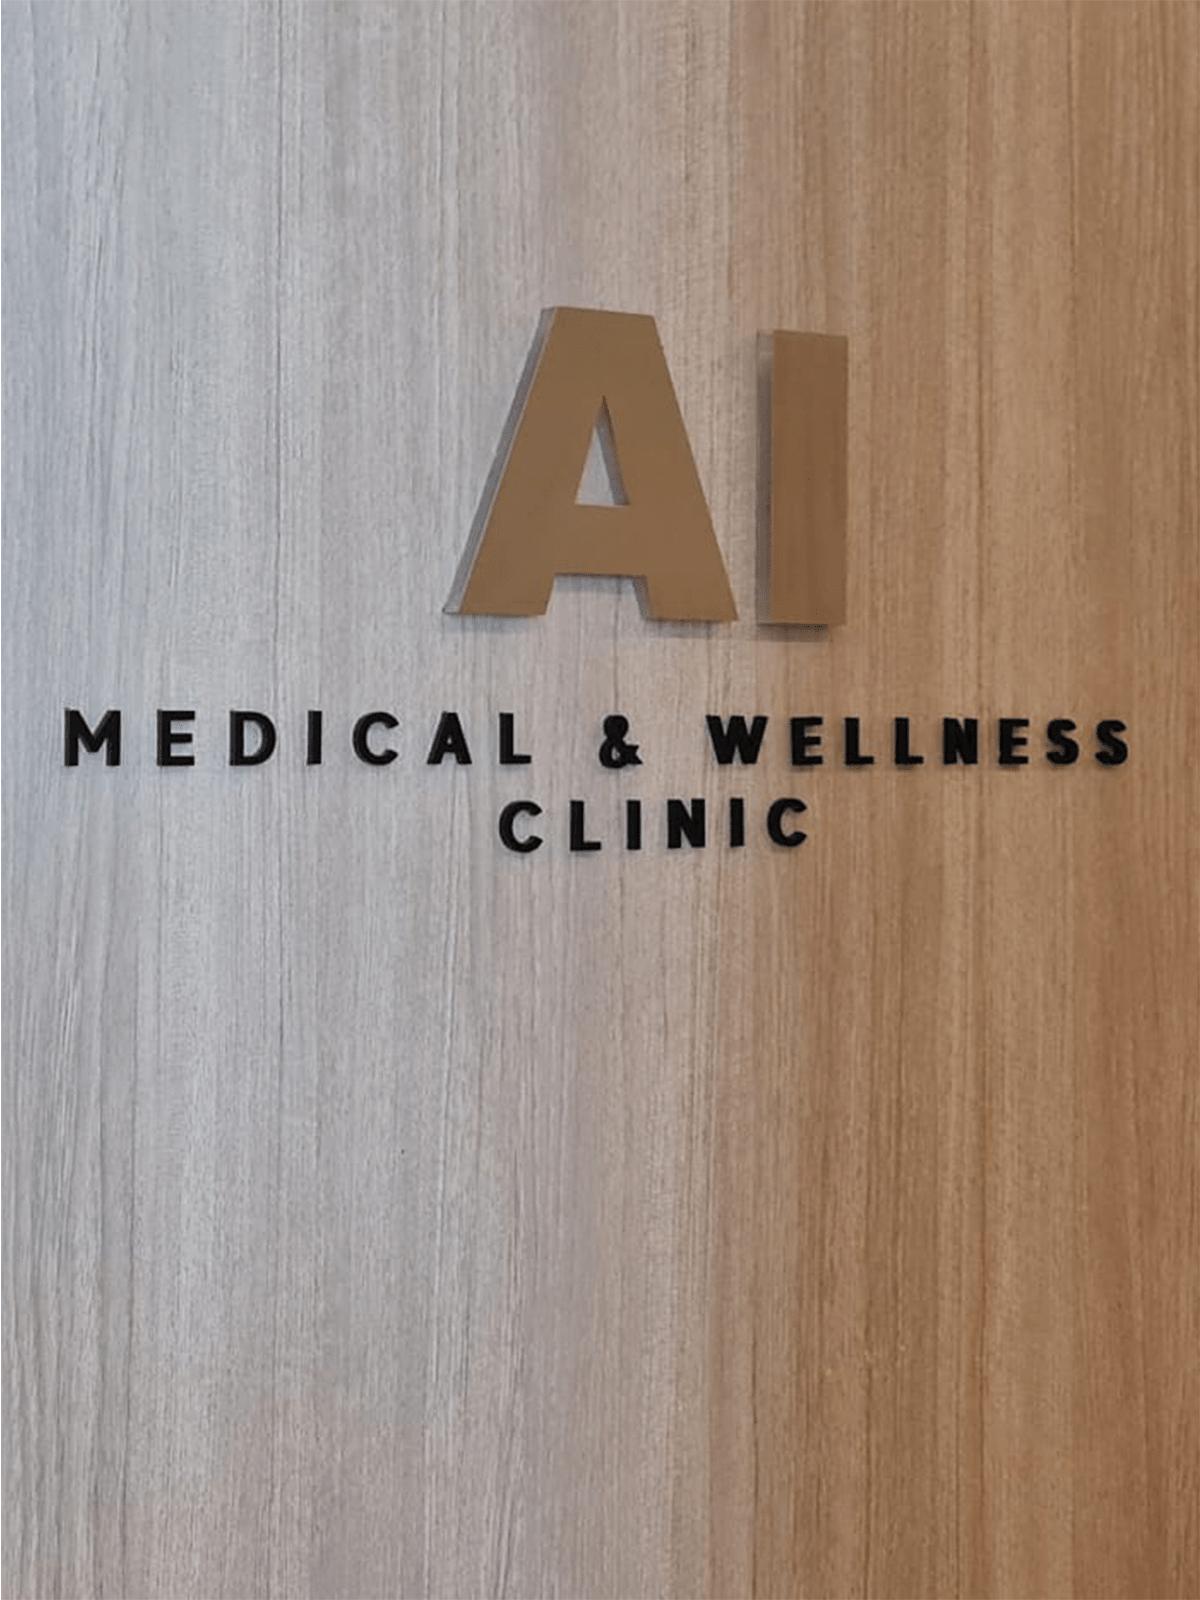 AI Medical & Wellness Clinic